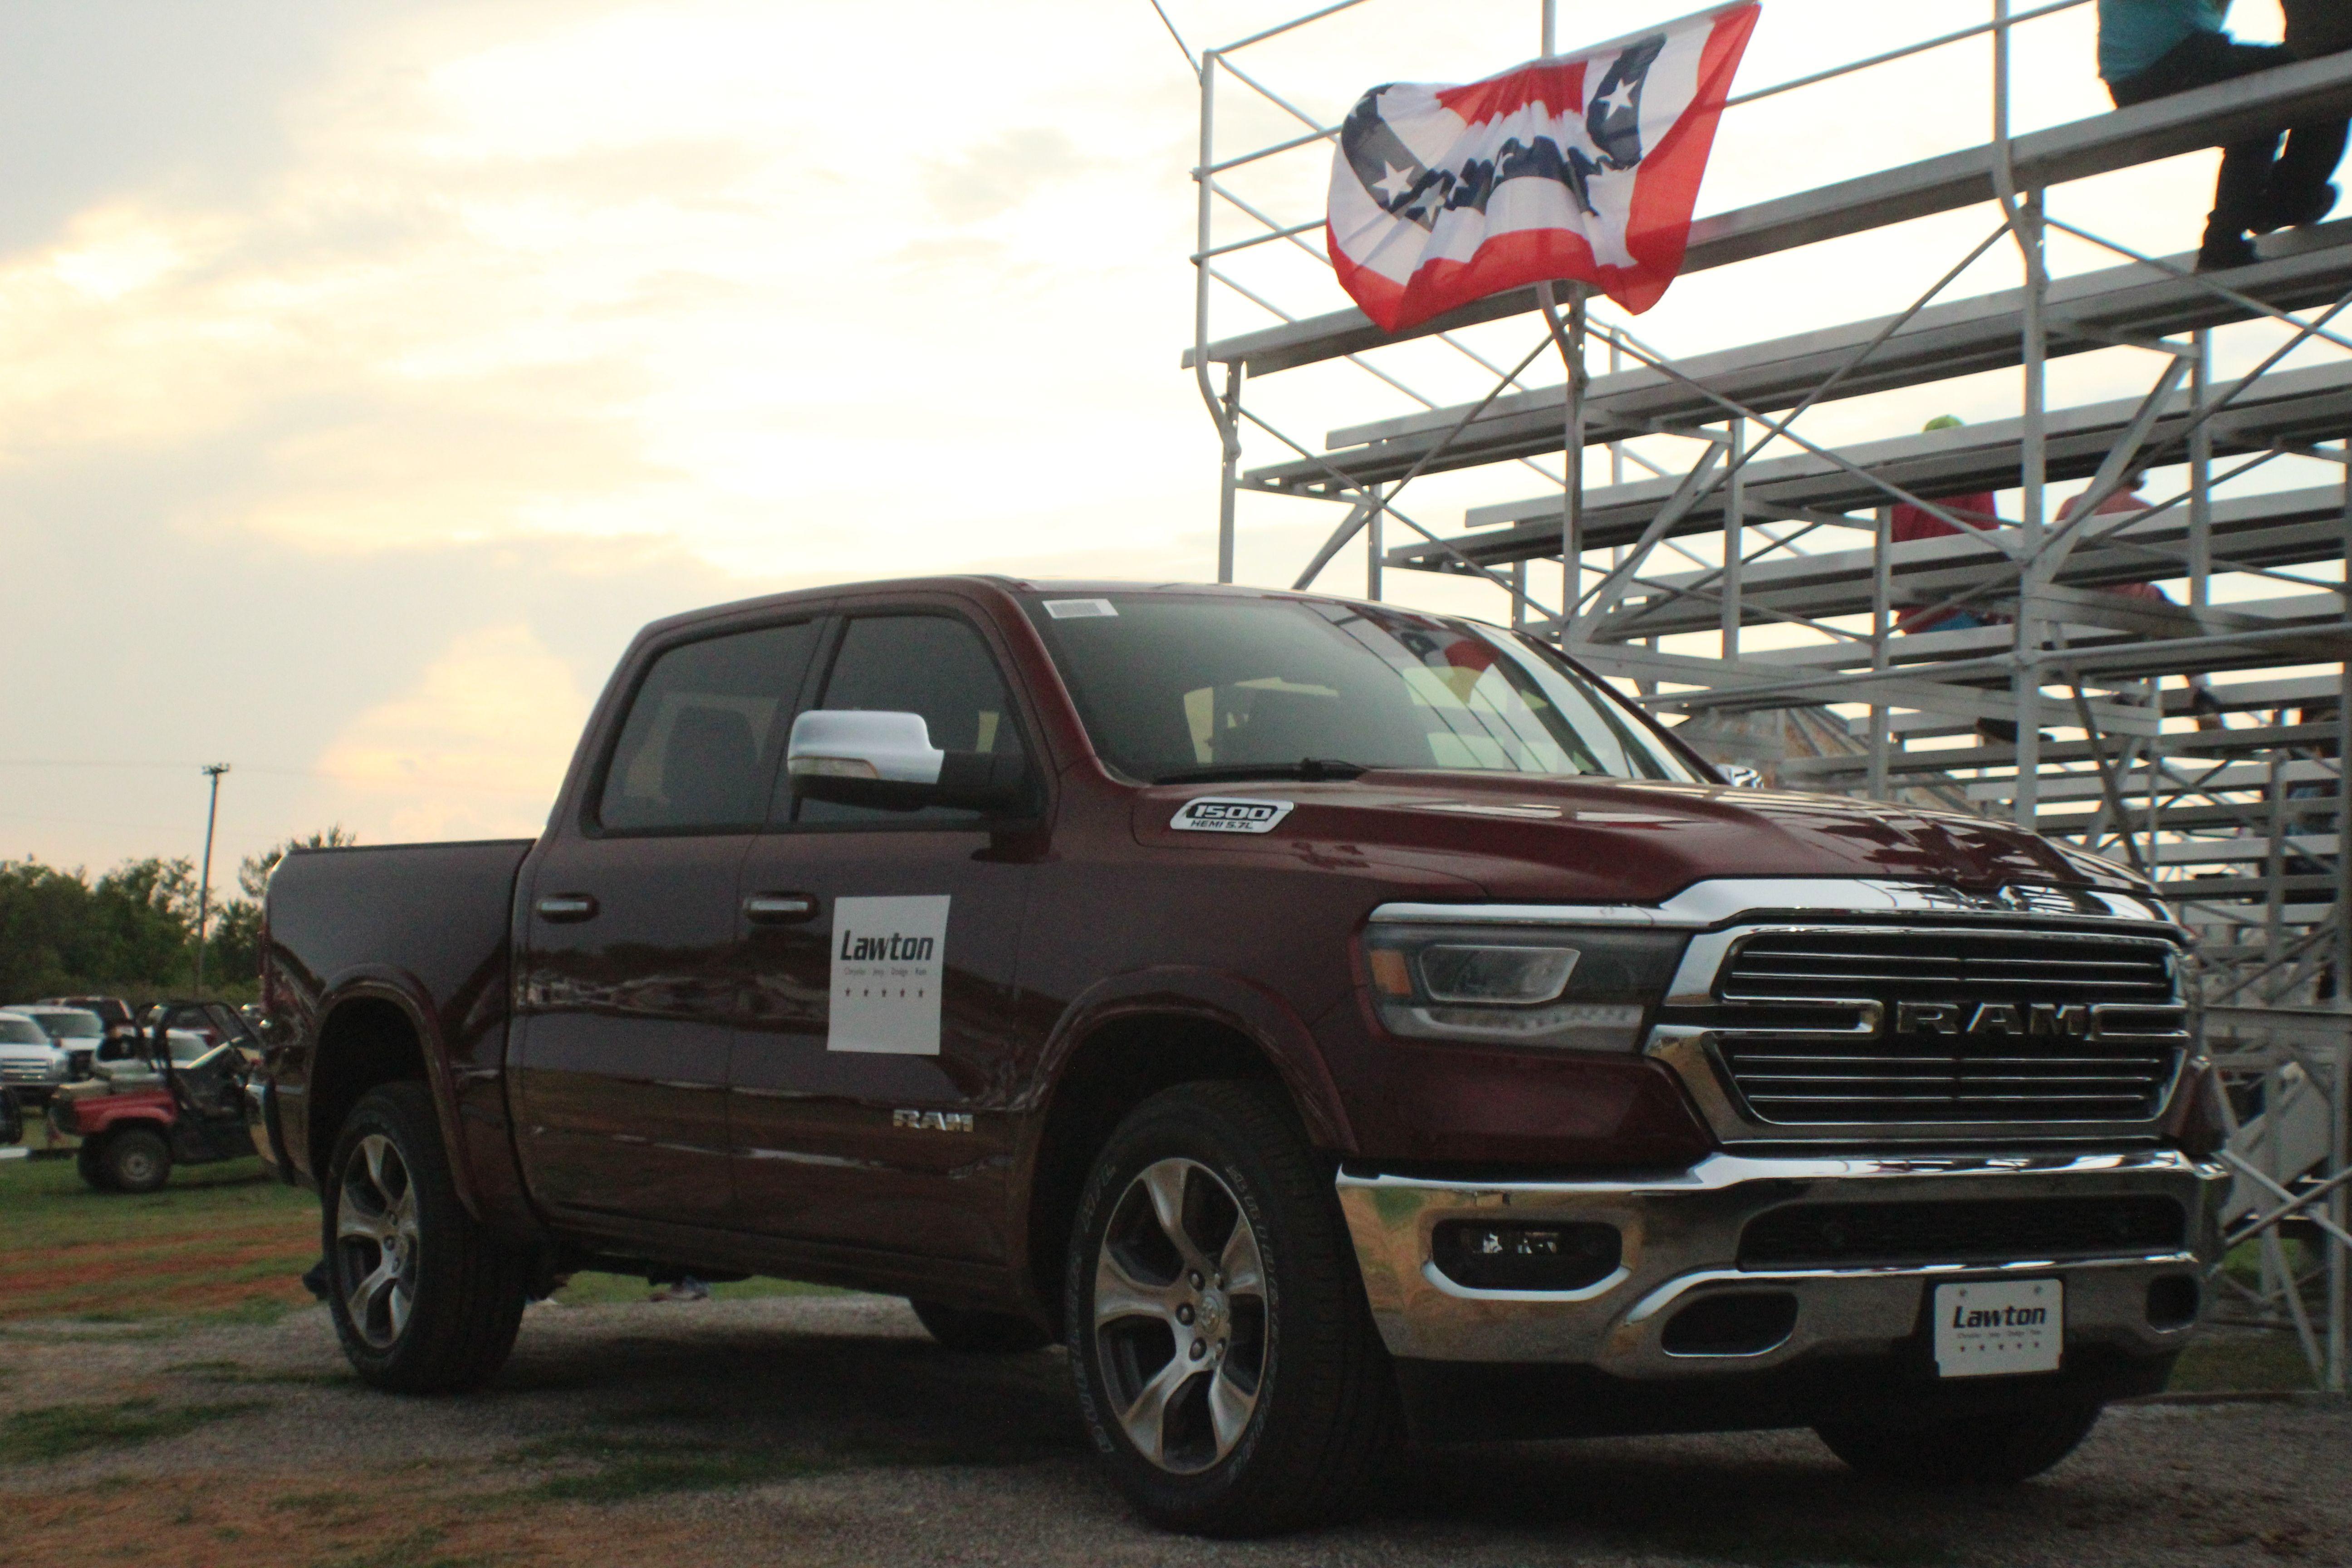 Lawton Chrysler Jeep Dodge Ram Sponsored The Elgin Rodeo In Elgin